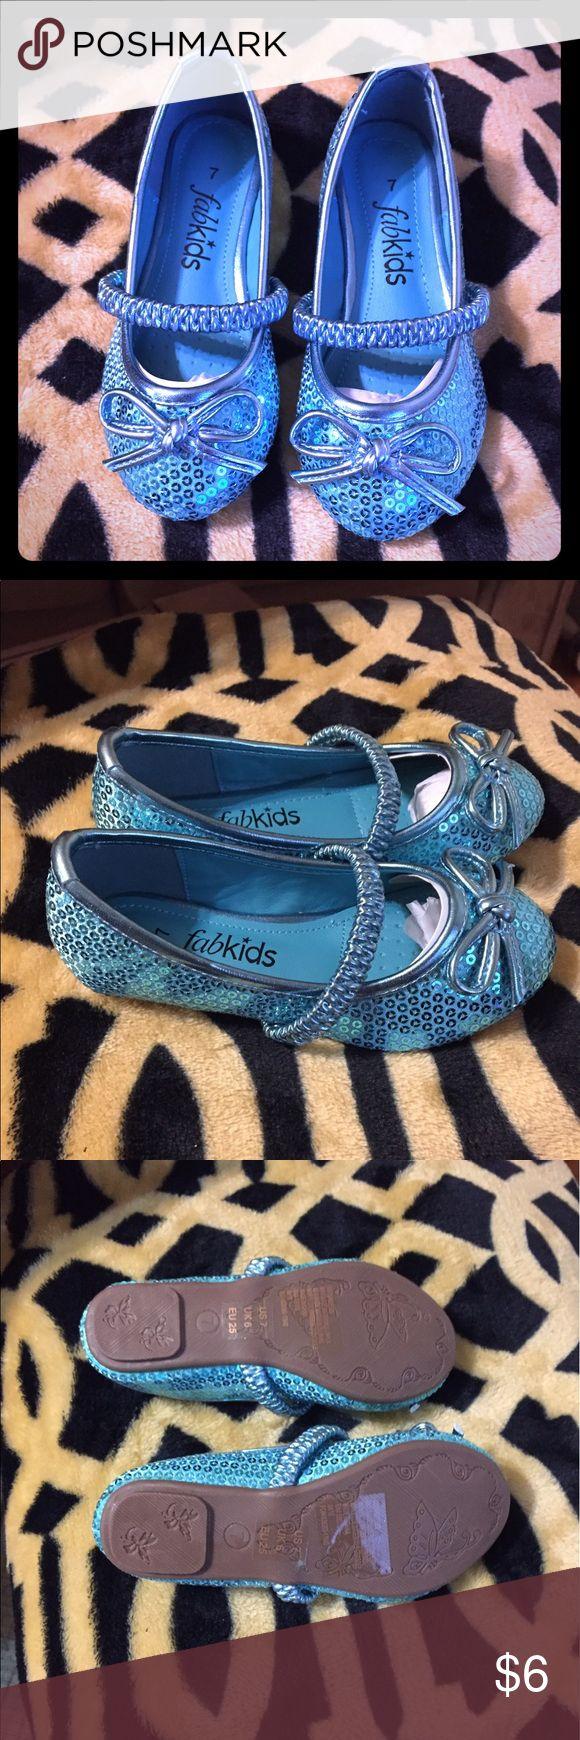 Girls Blue Sequin Flats Justfab Kids little girls blue sequin ballet flats. Never worn. Size 7 fabkids Shoes Flats & Loafers